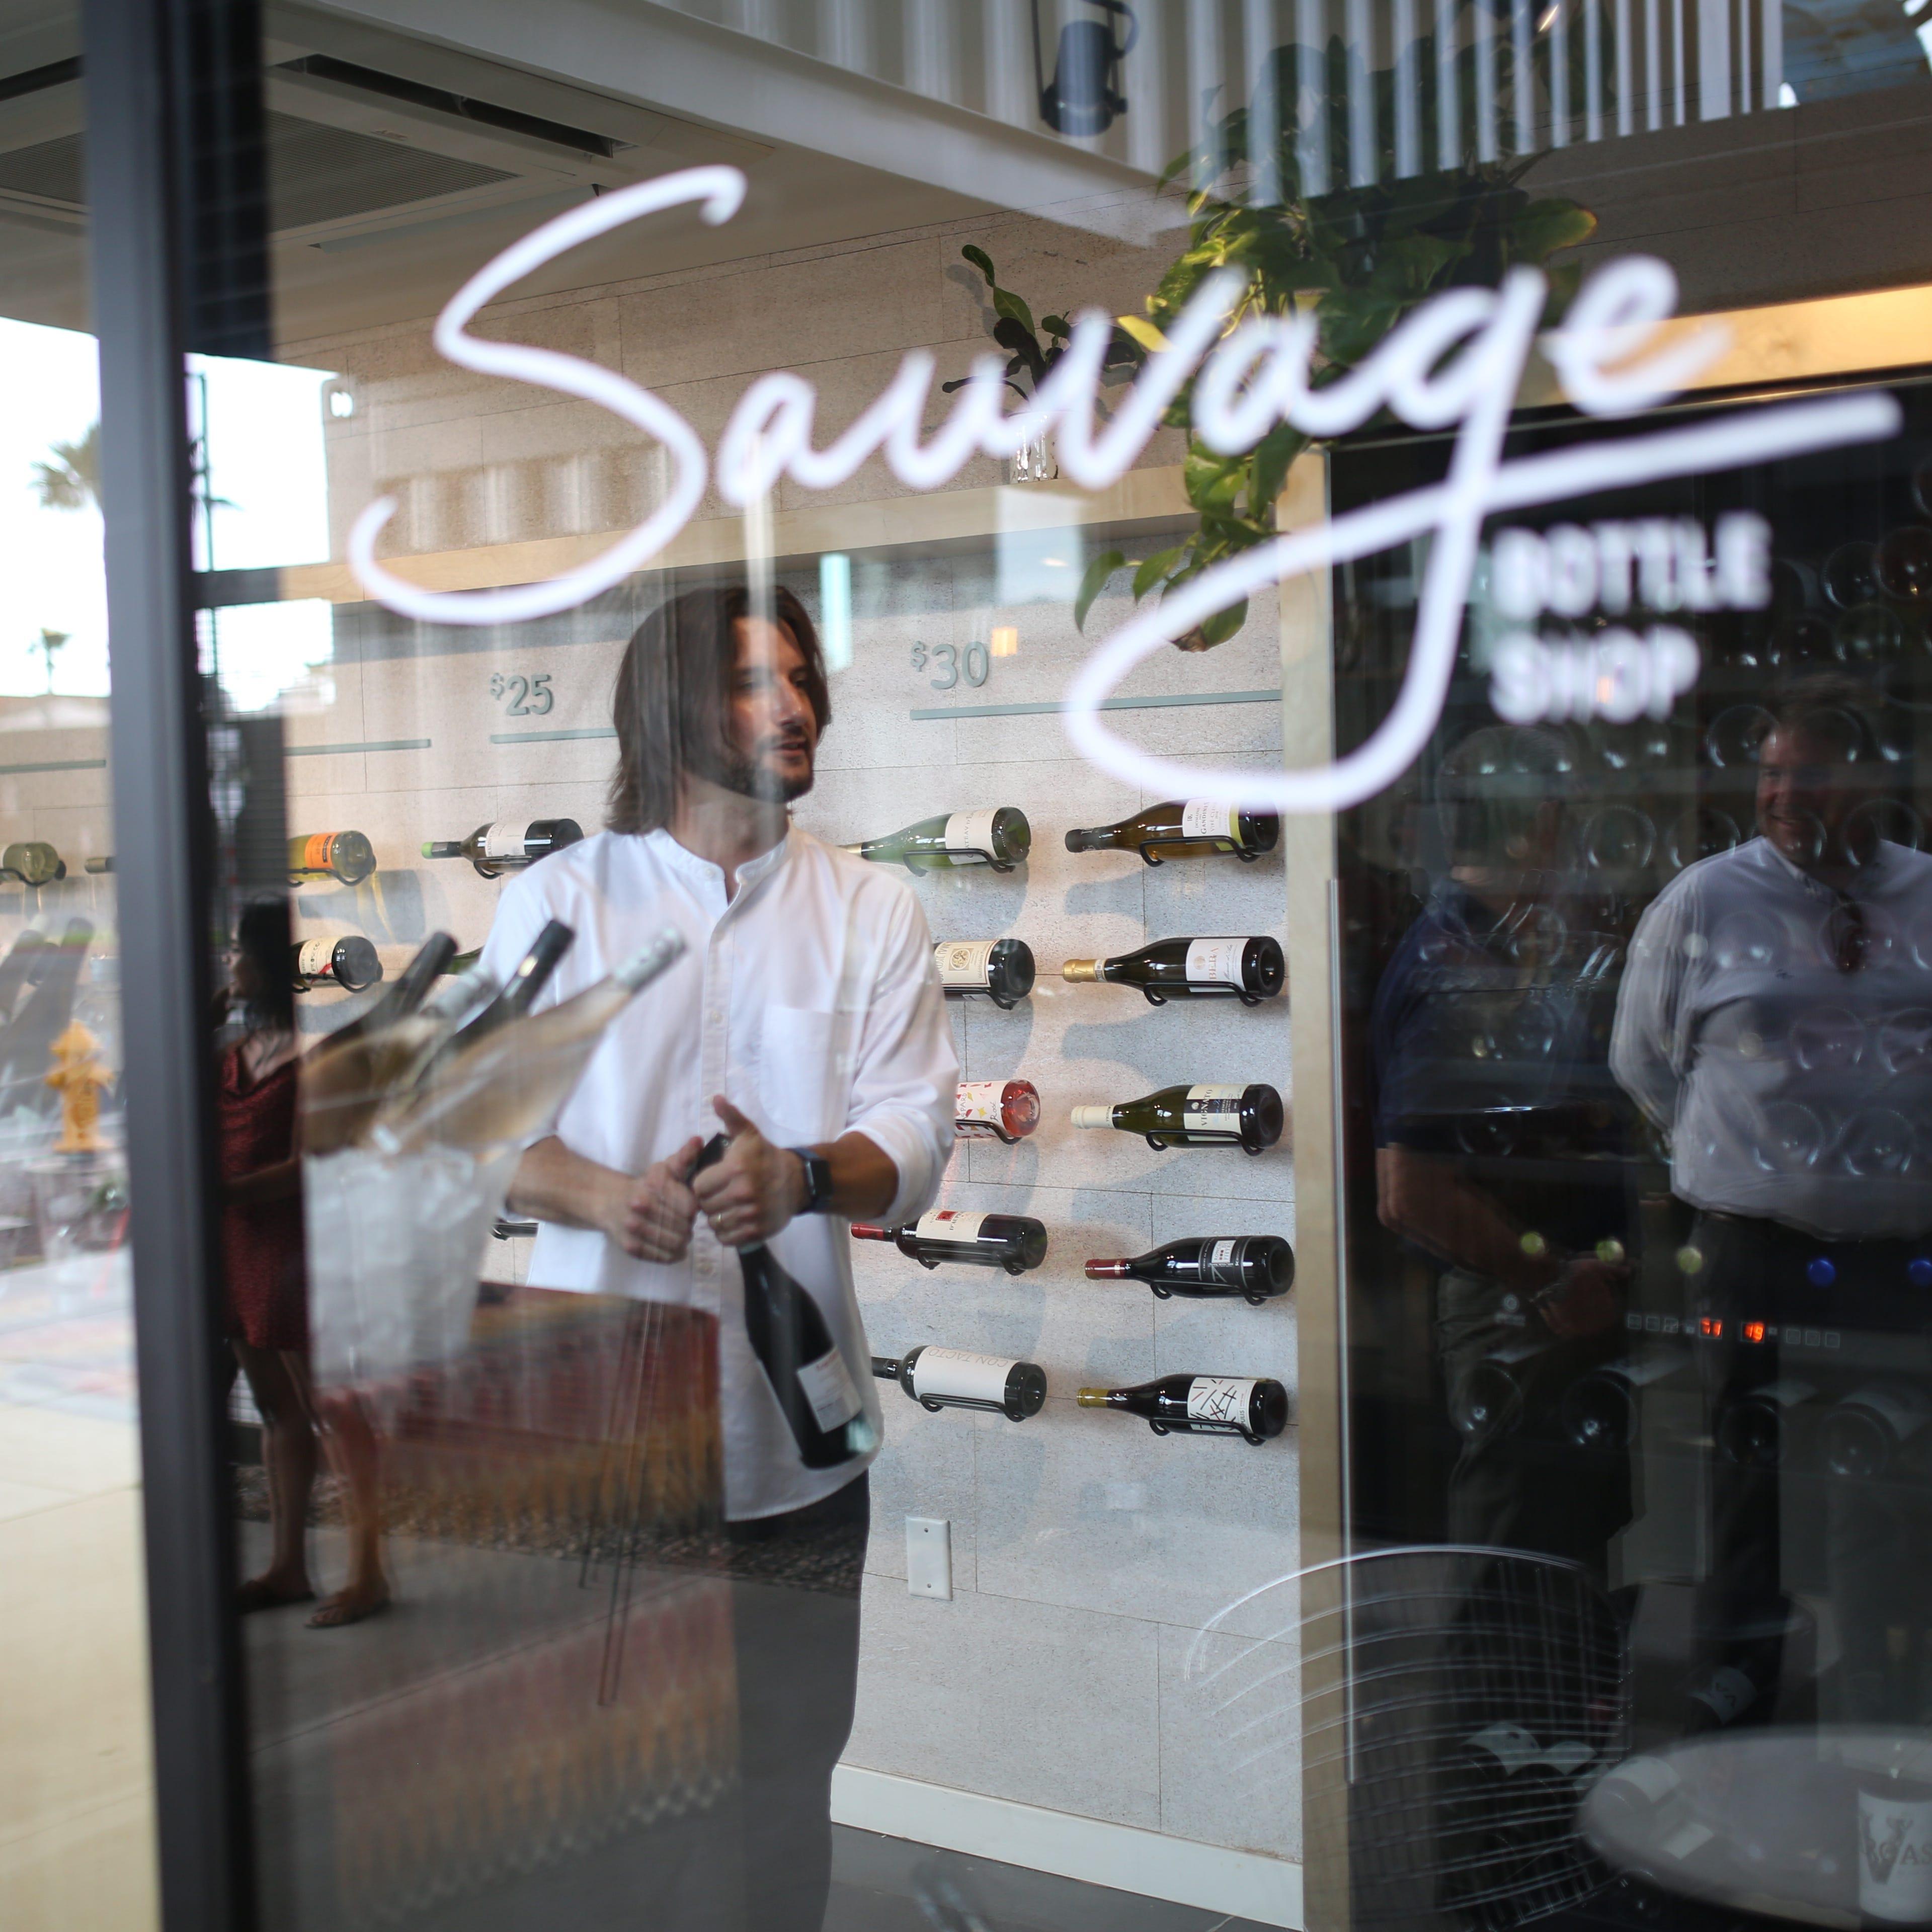 Looking for Arizona wine? 10 best local wine stores in Phoenix